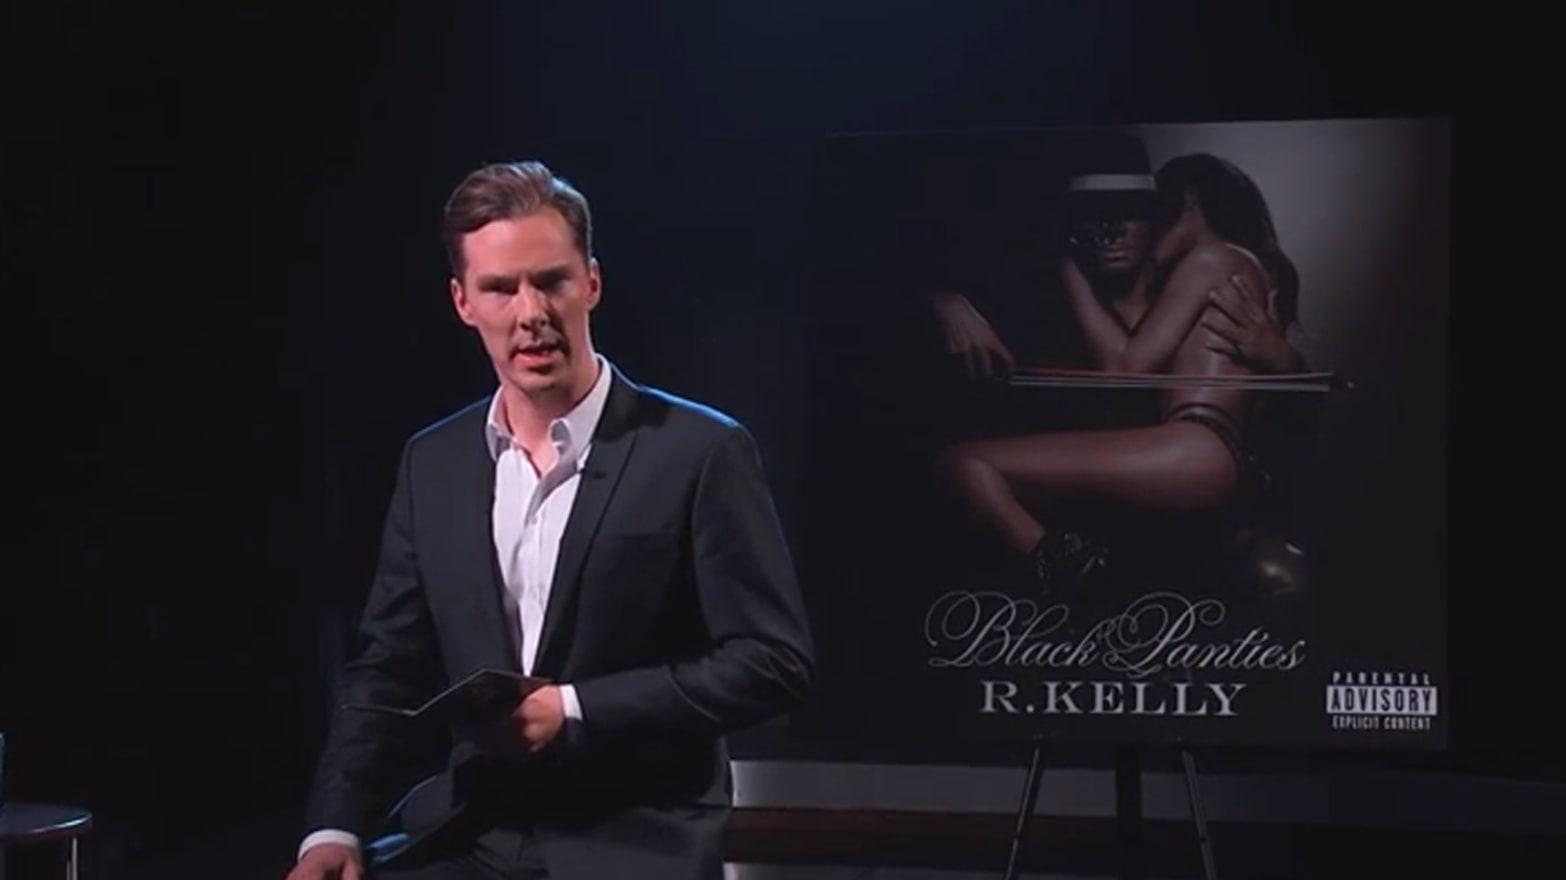 6e2d2457a Benedict Cumberbatch Reads R. Kelly